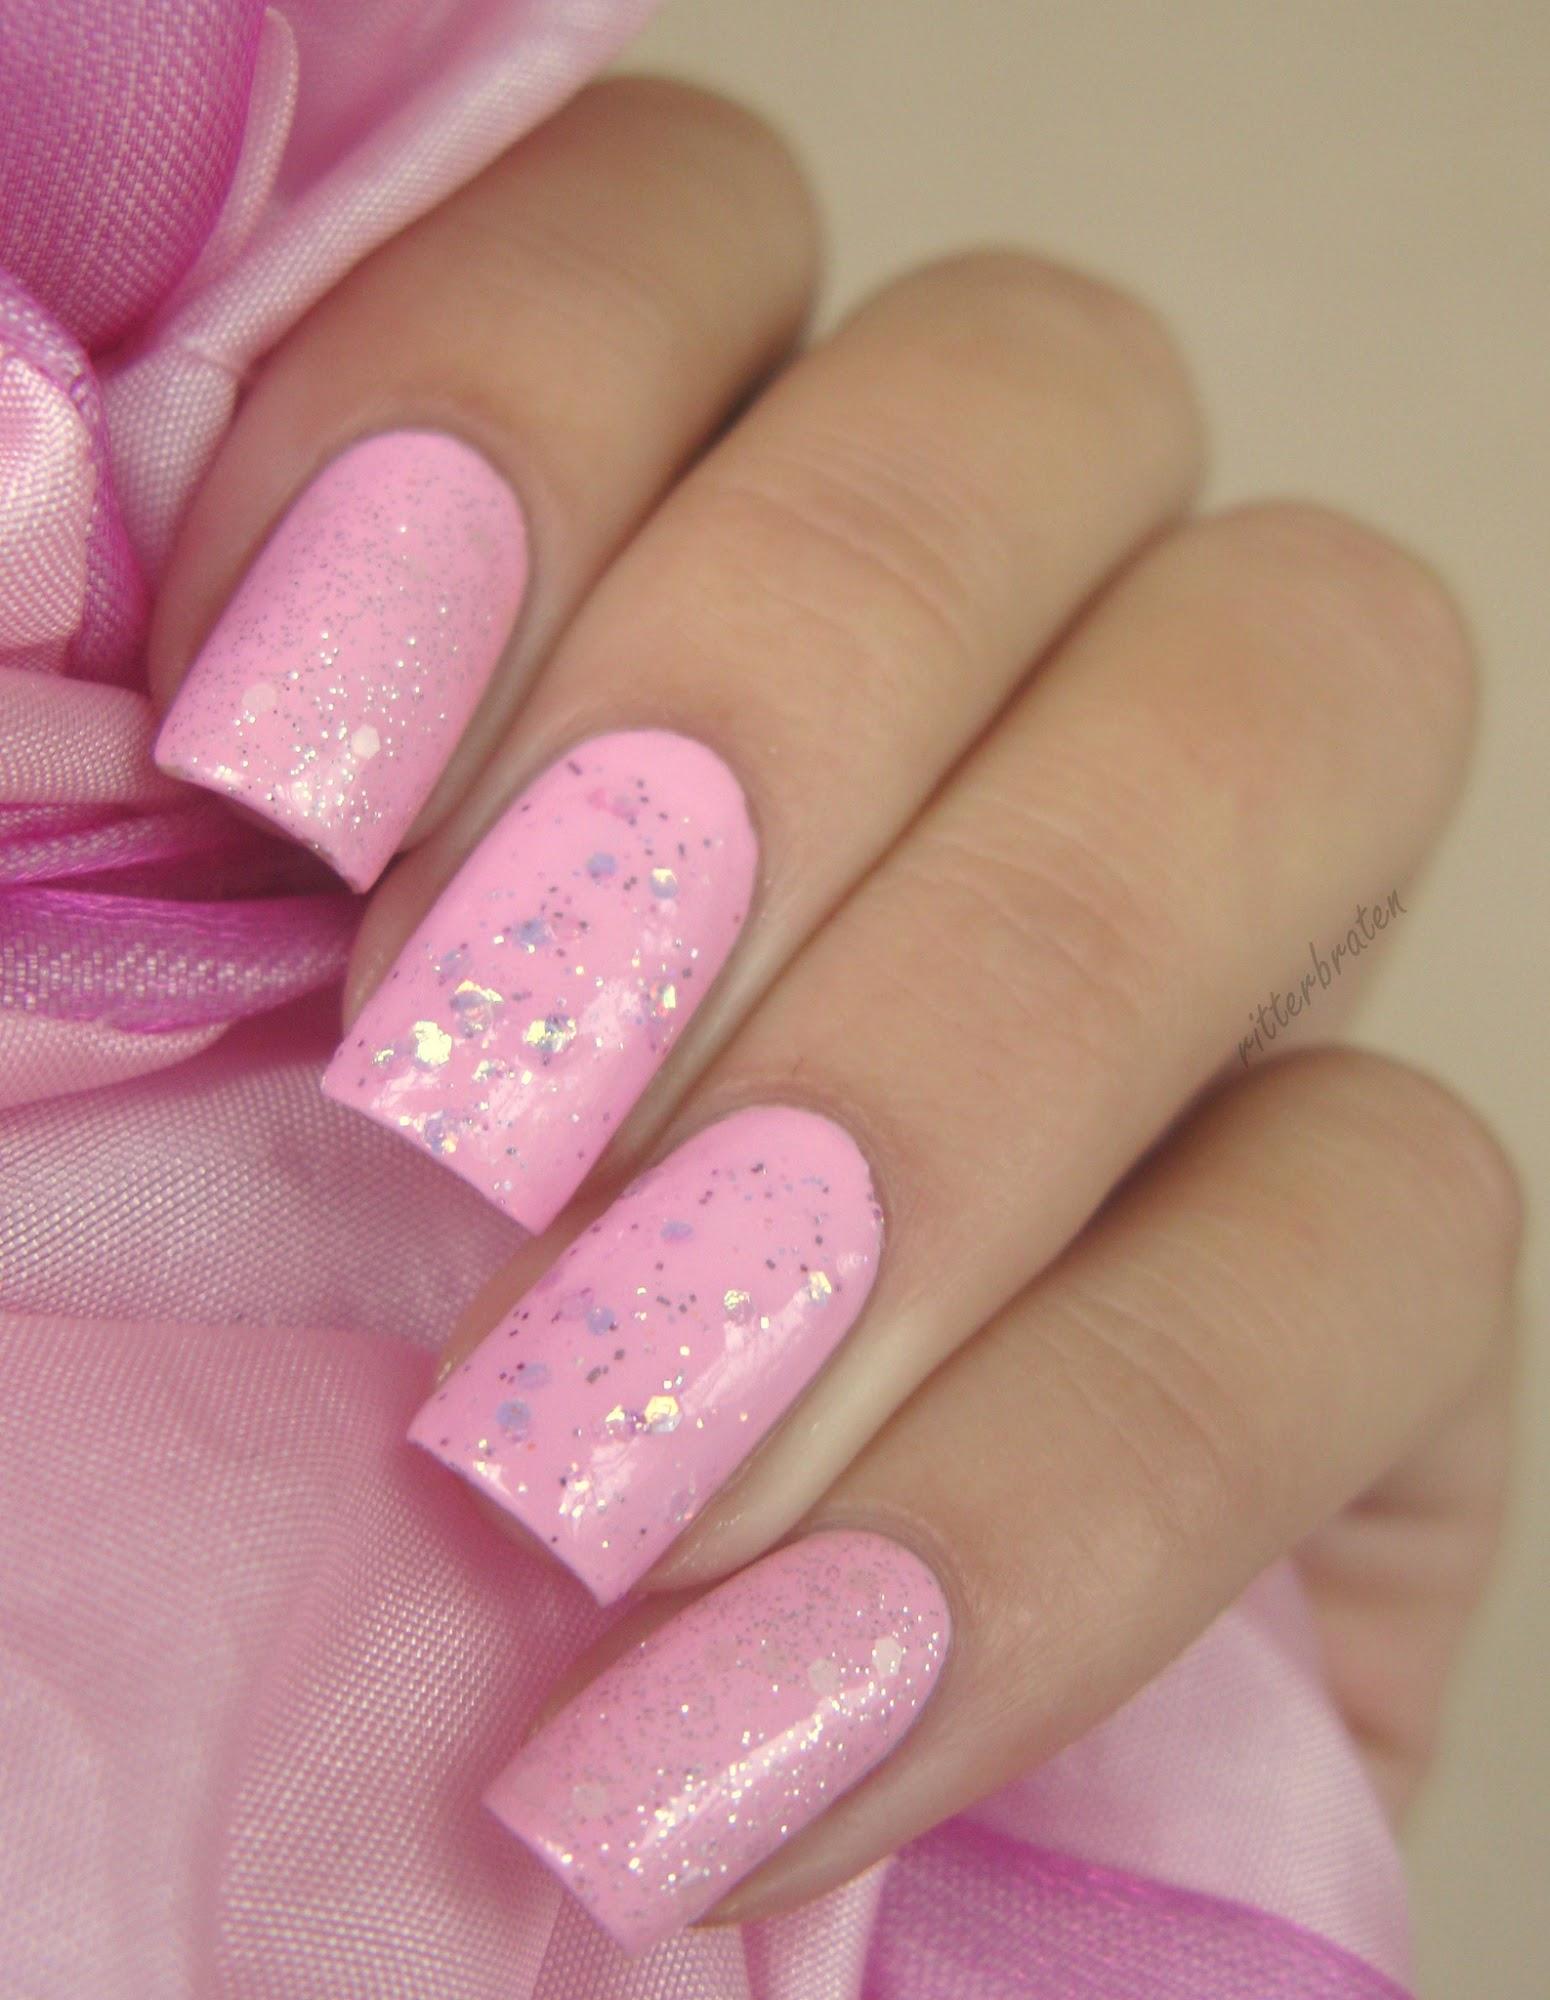 BK Deluxe nail polish